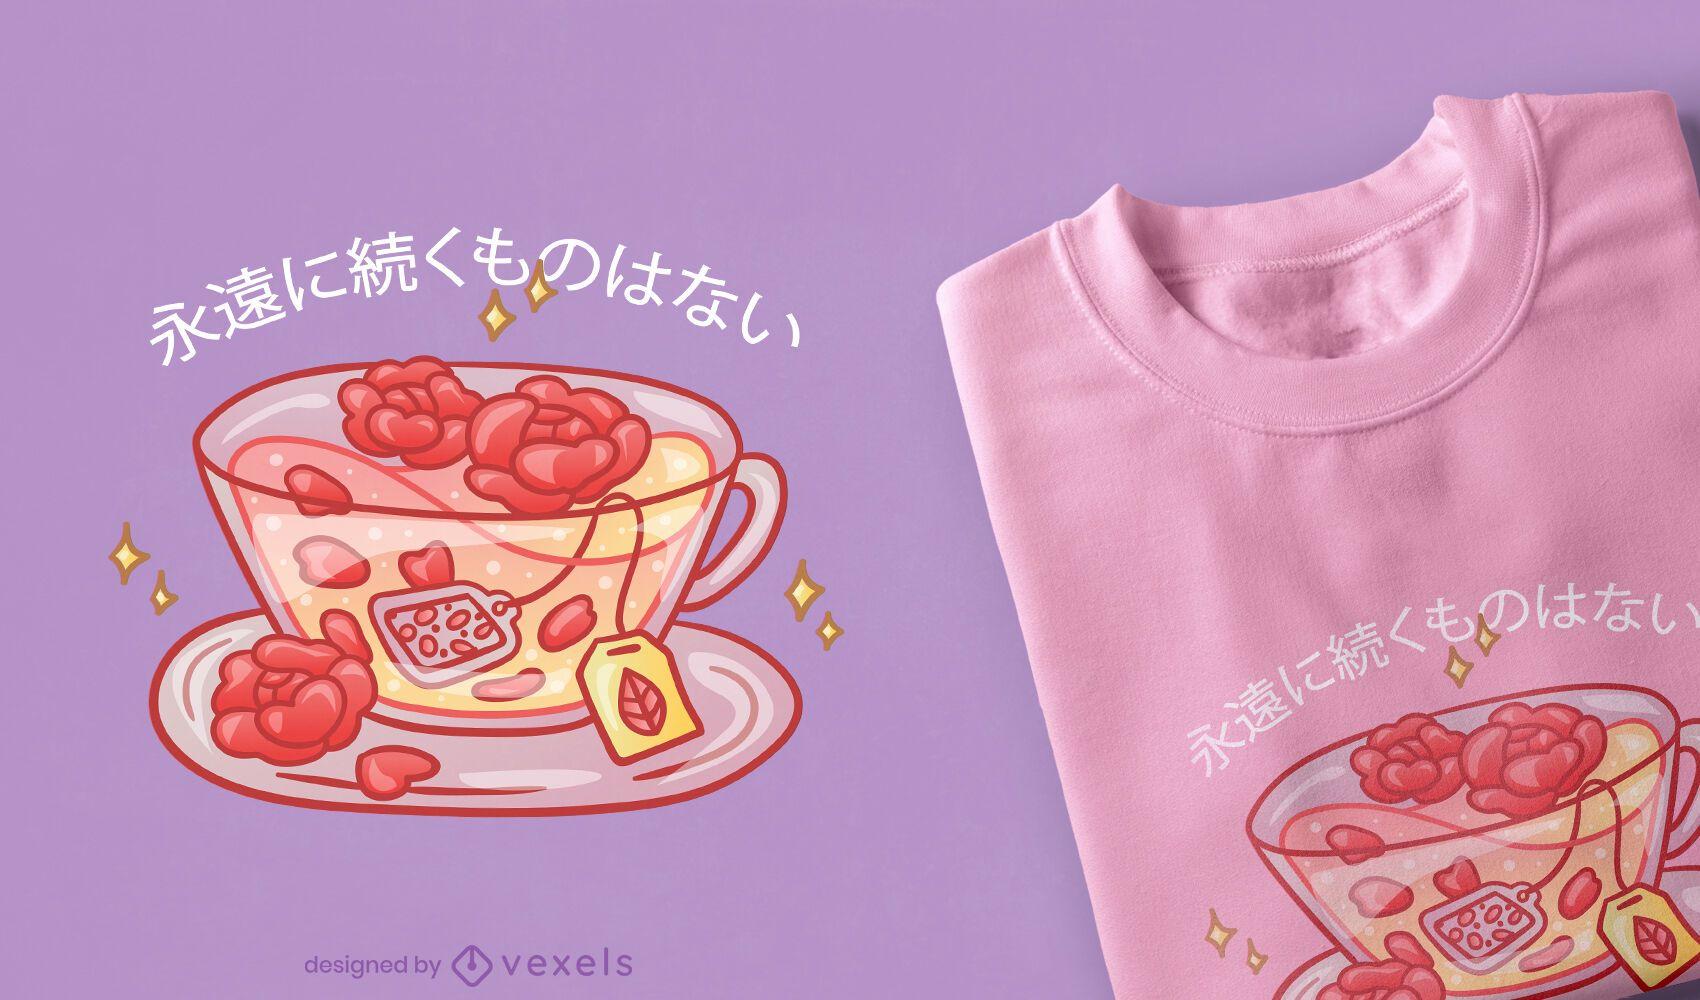 Dise?o de camiseta rosa t? kawaii